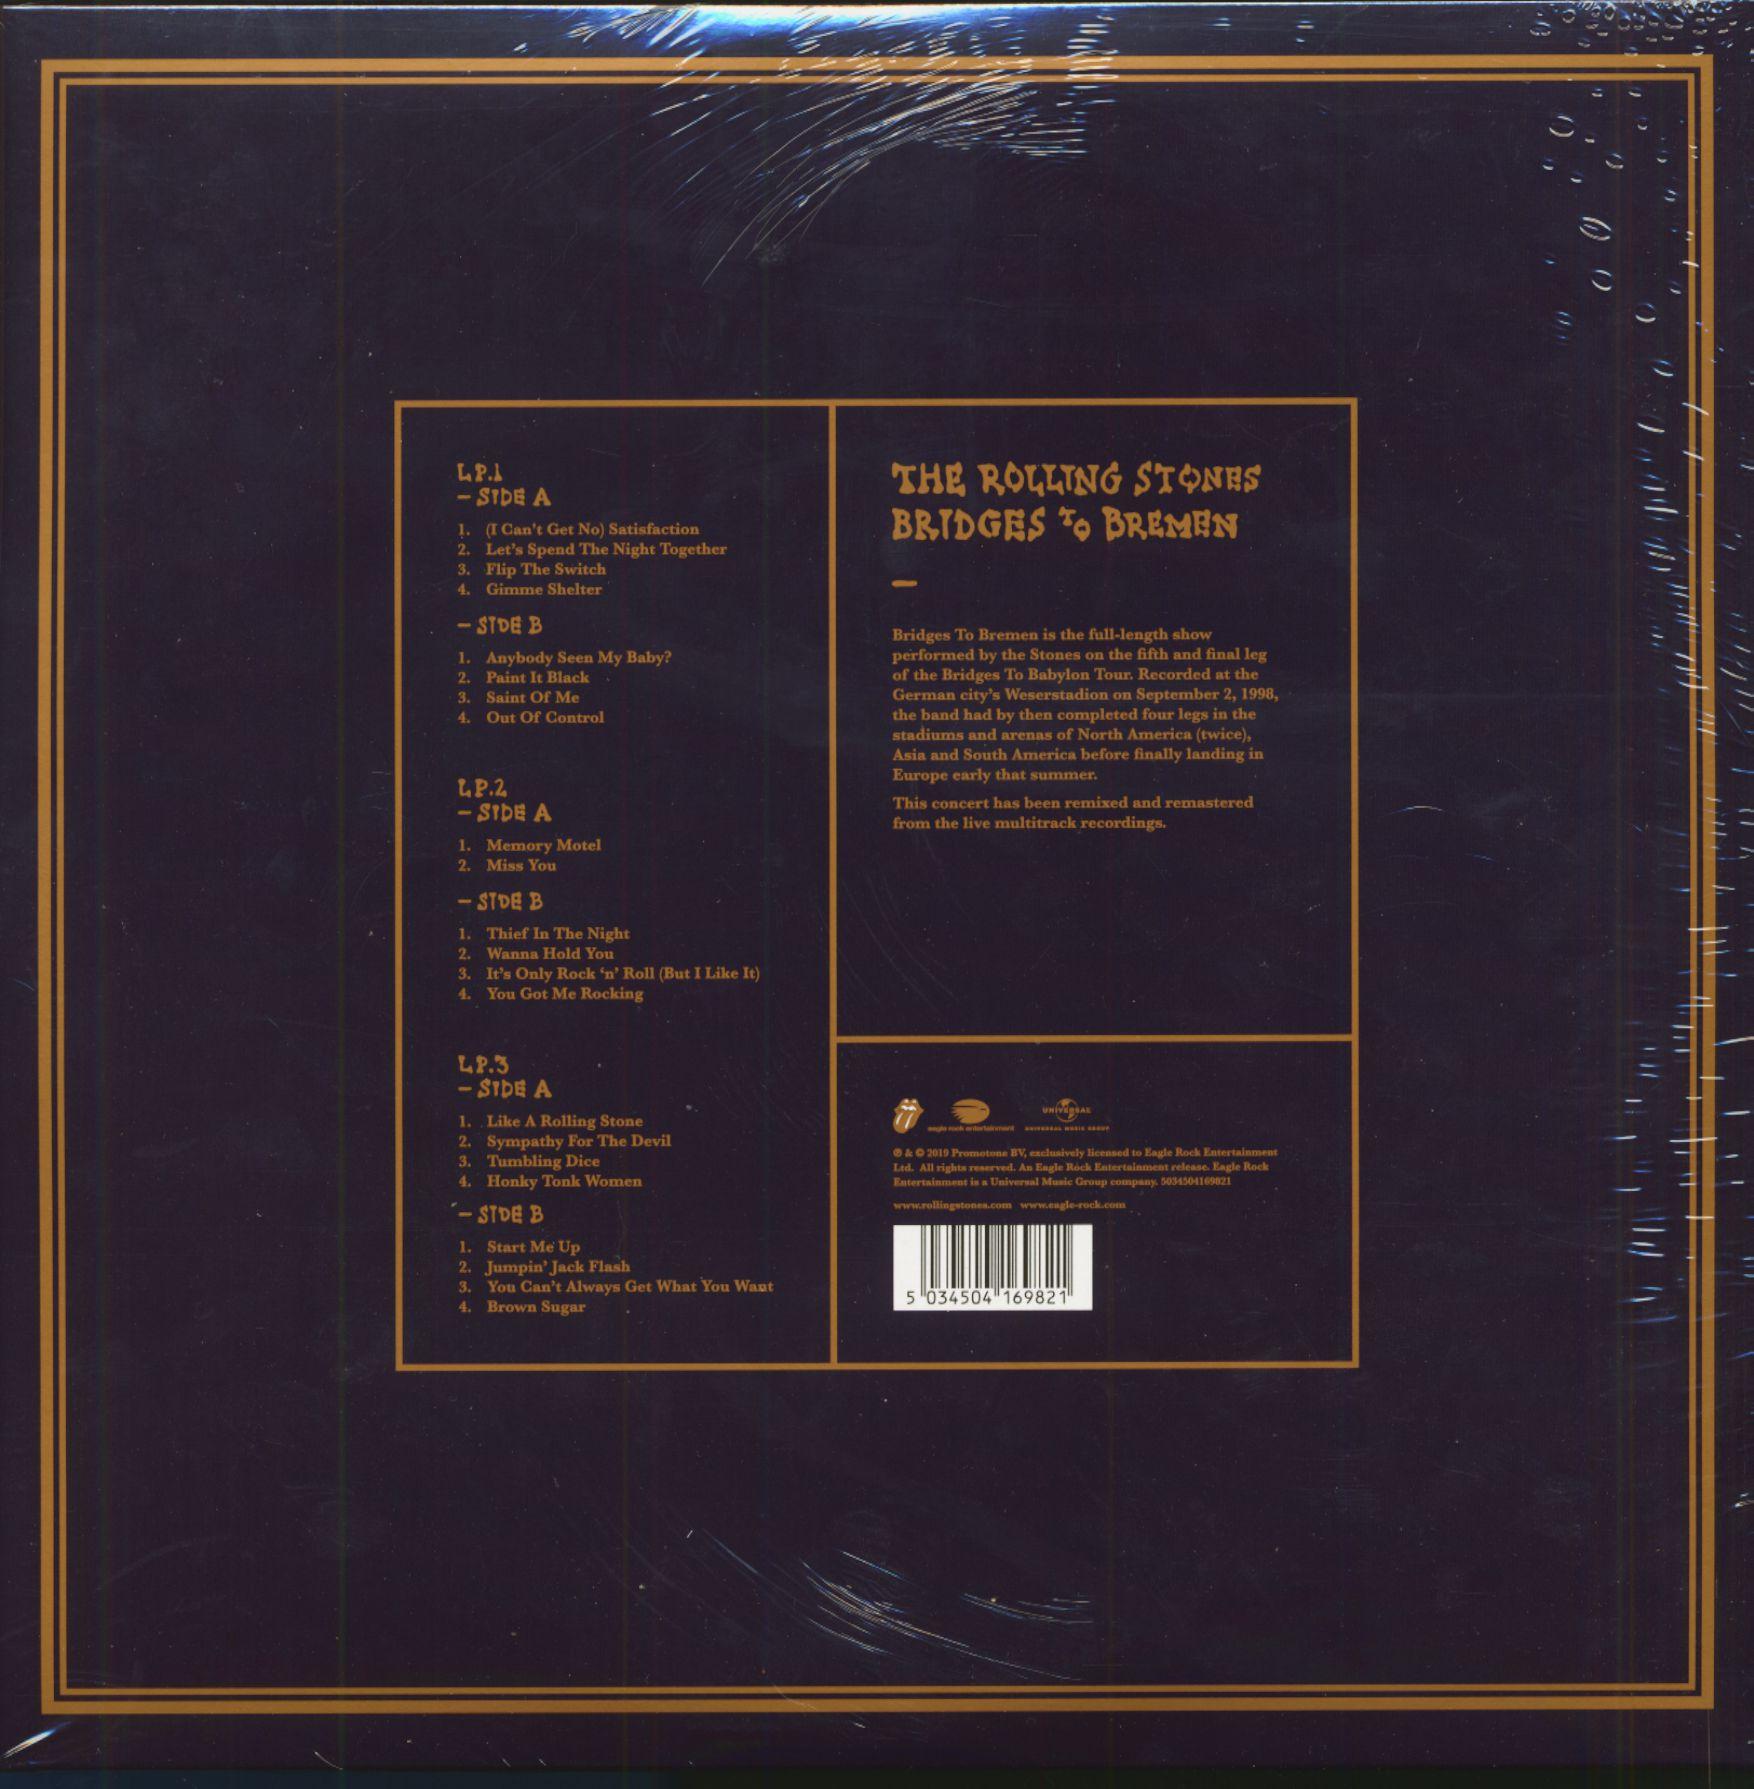 The Rolling Stones Bridges To Bremen (3-LP, 180g Vinyl)